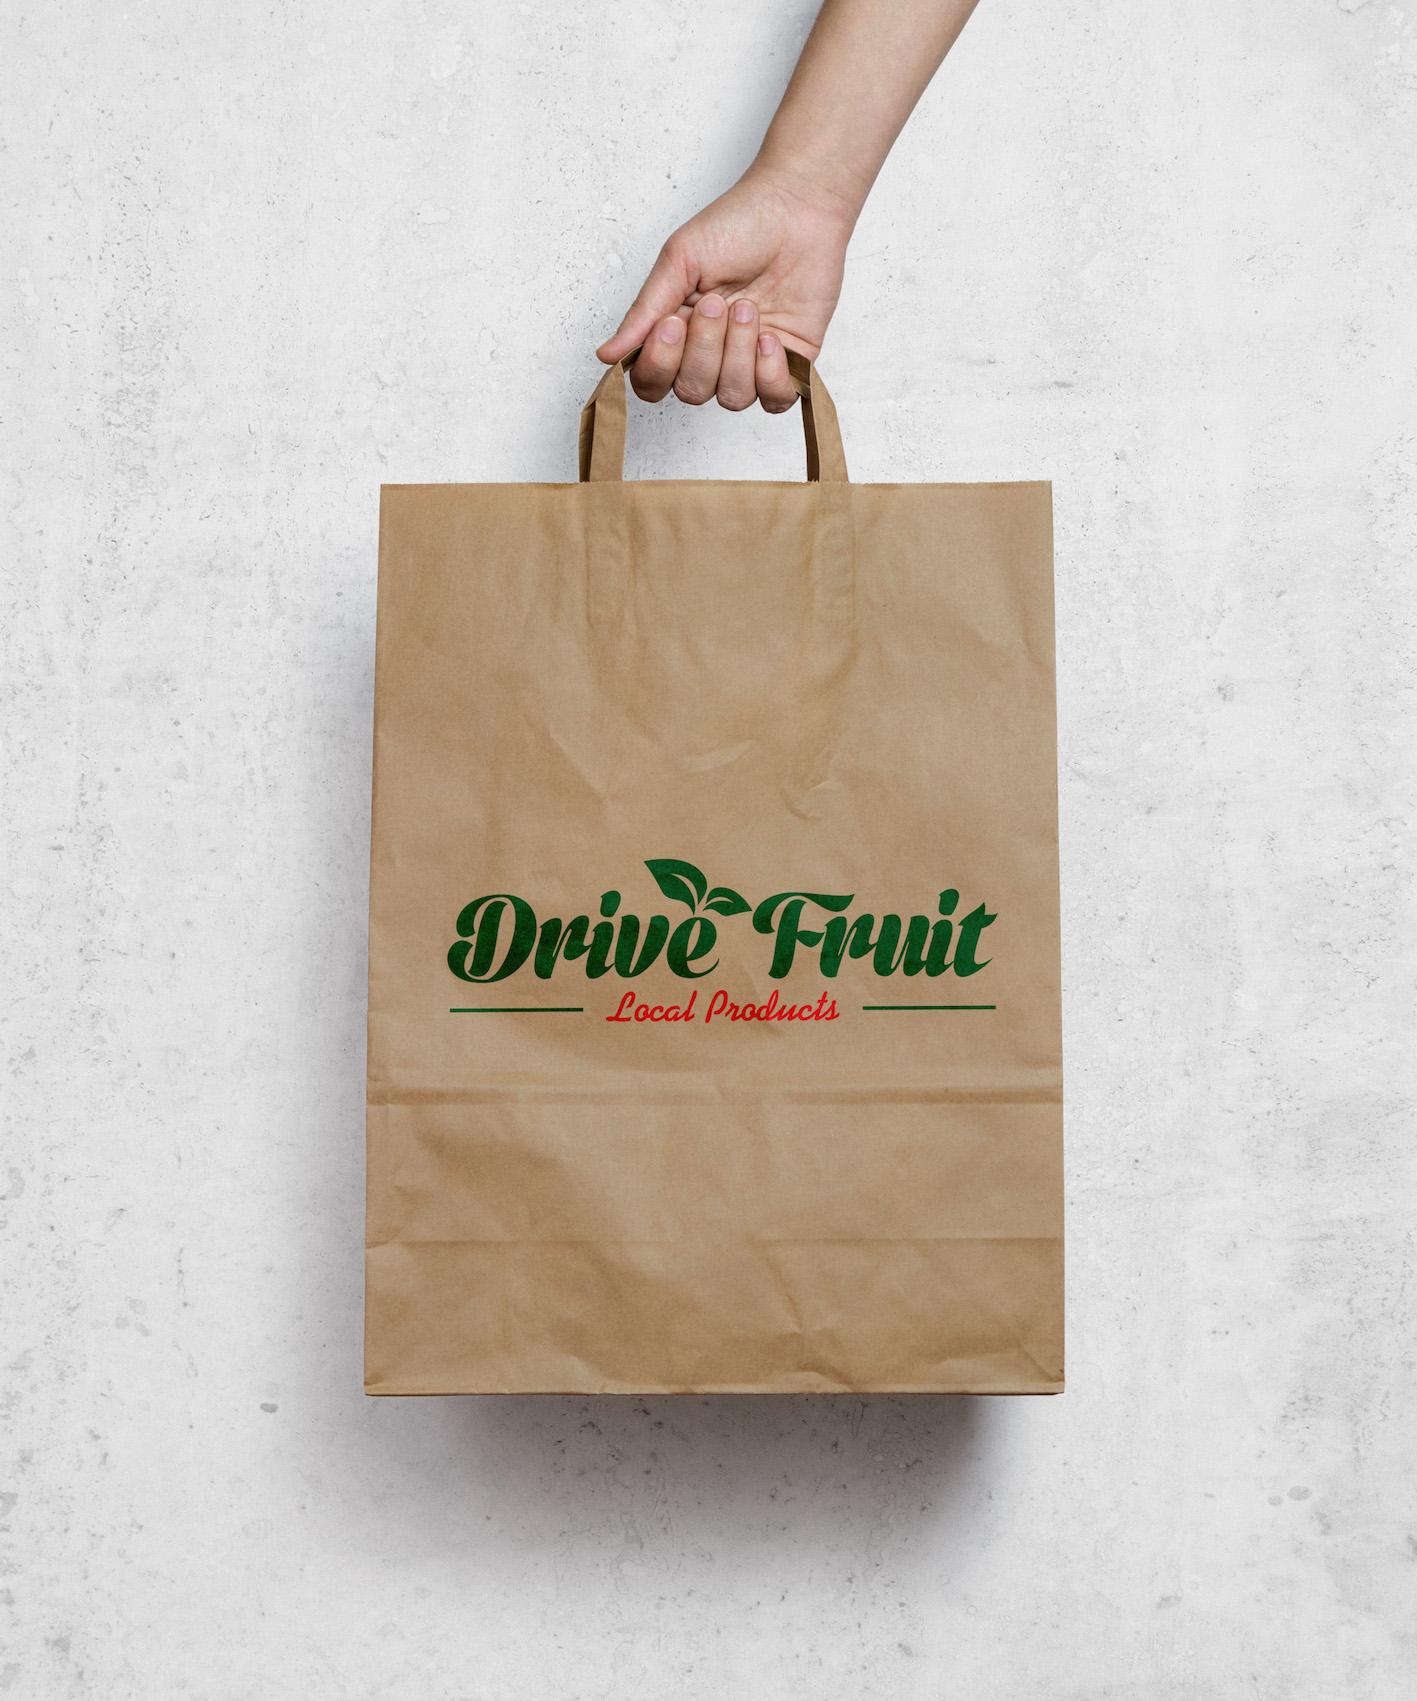 Drive Fruit